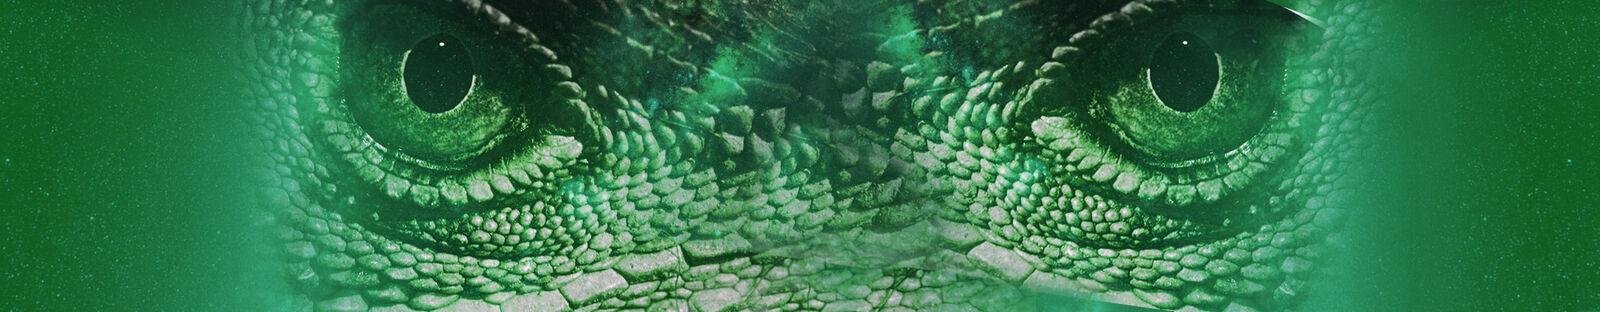 Green Dragon Lair